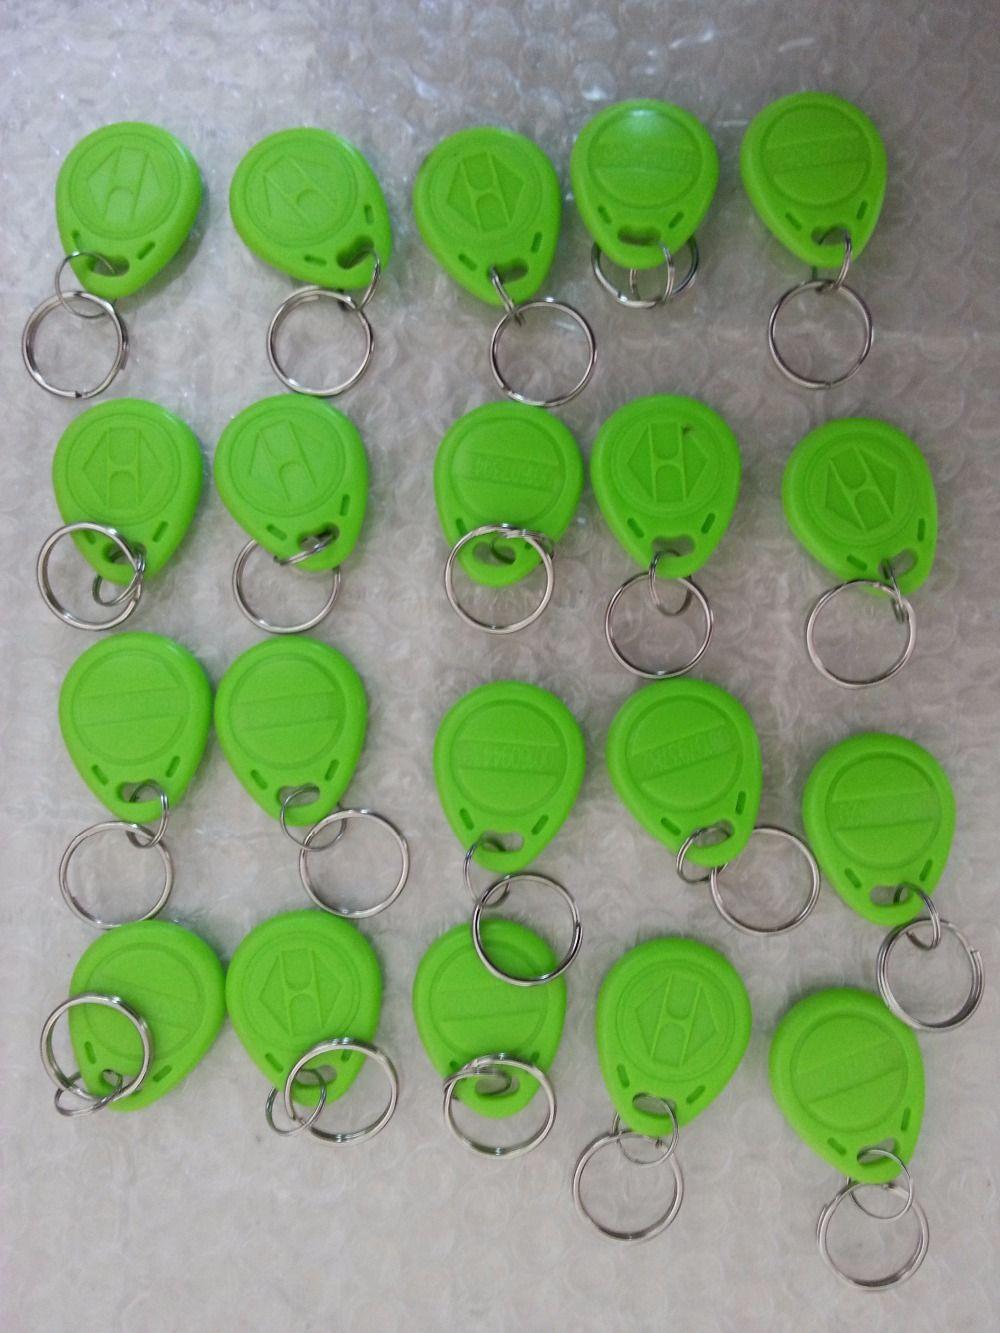 100pcs Em Id Keyfobs Rfid Tag Key Ring Card 125khz Proximity Token Access Green Color For Door Lock Access Controller Read Access Control Rfid Tag Green Colors